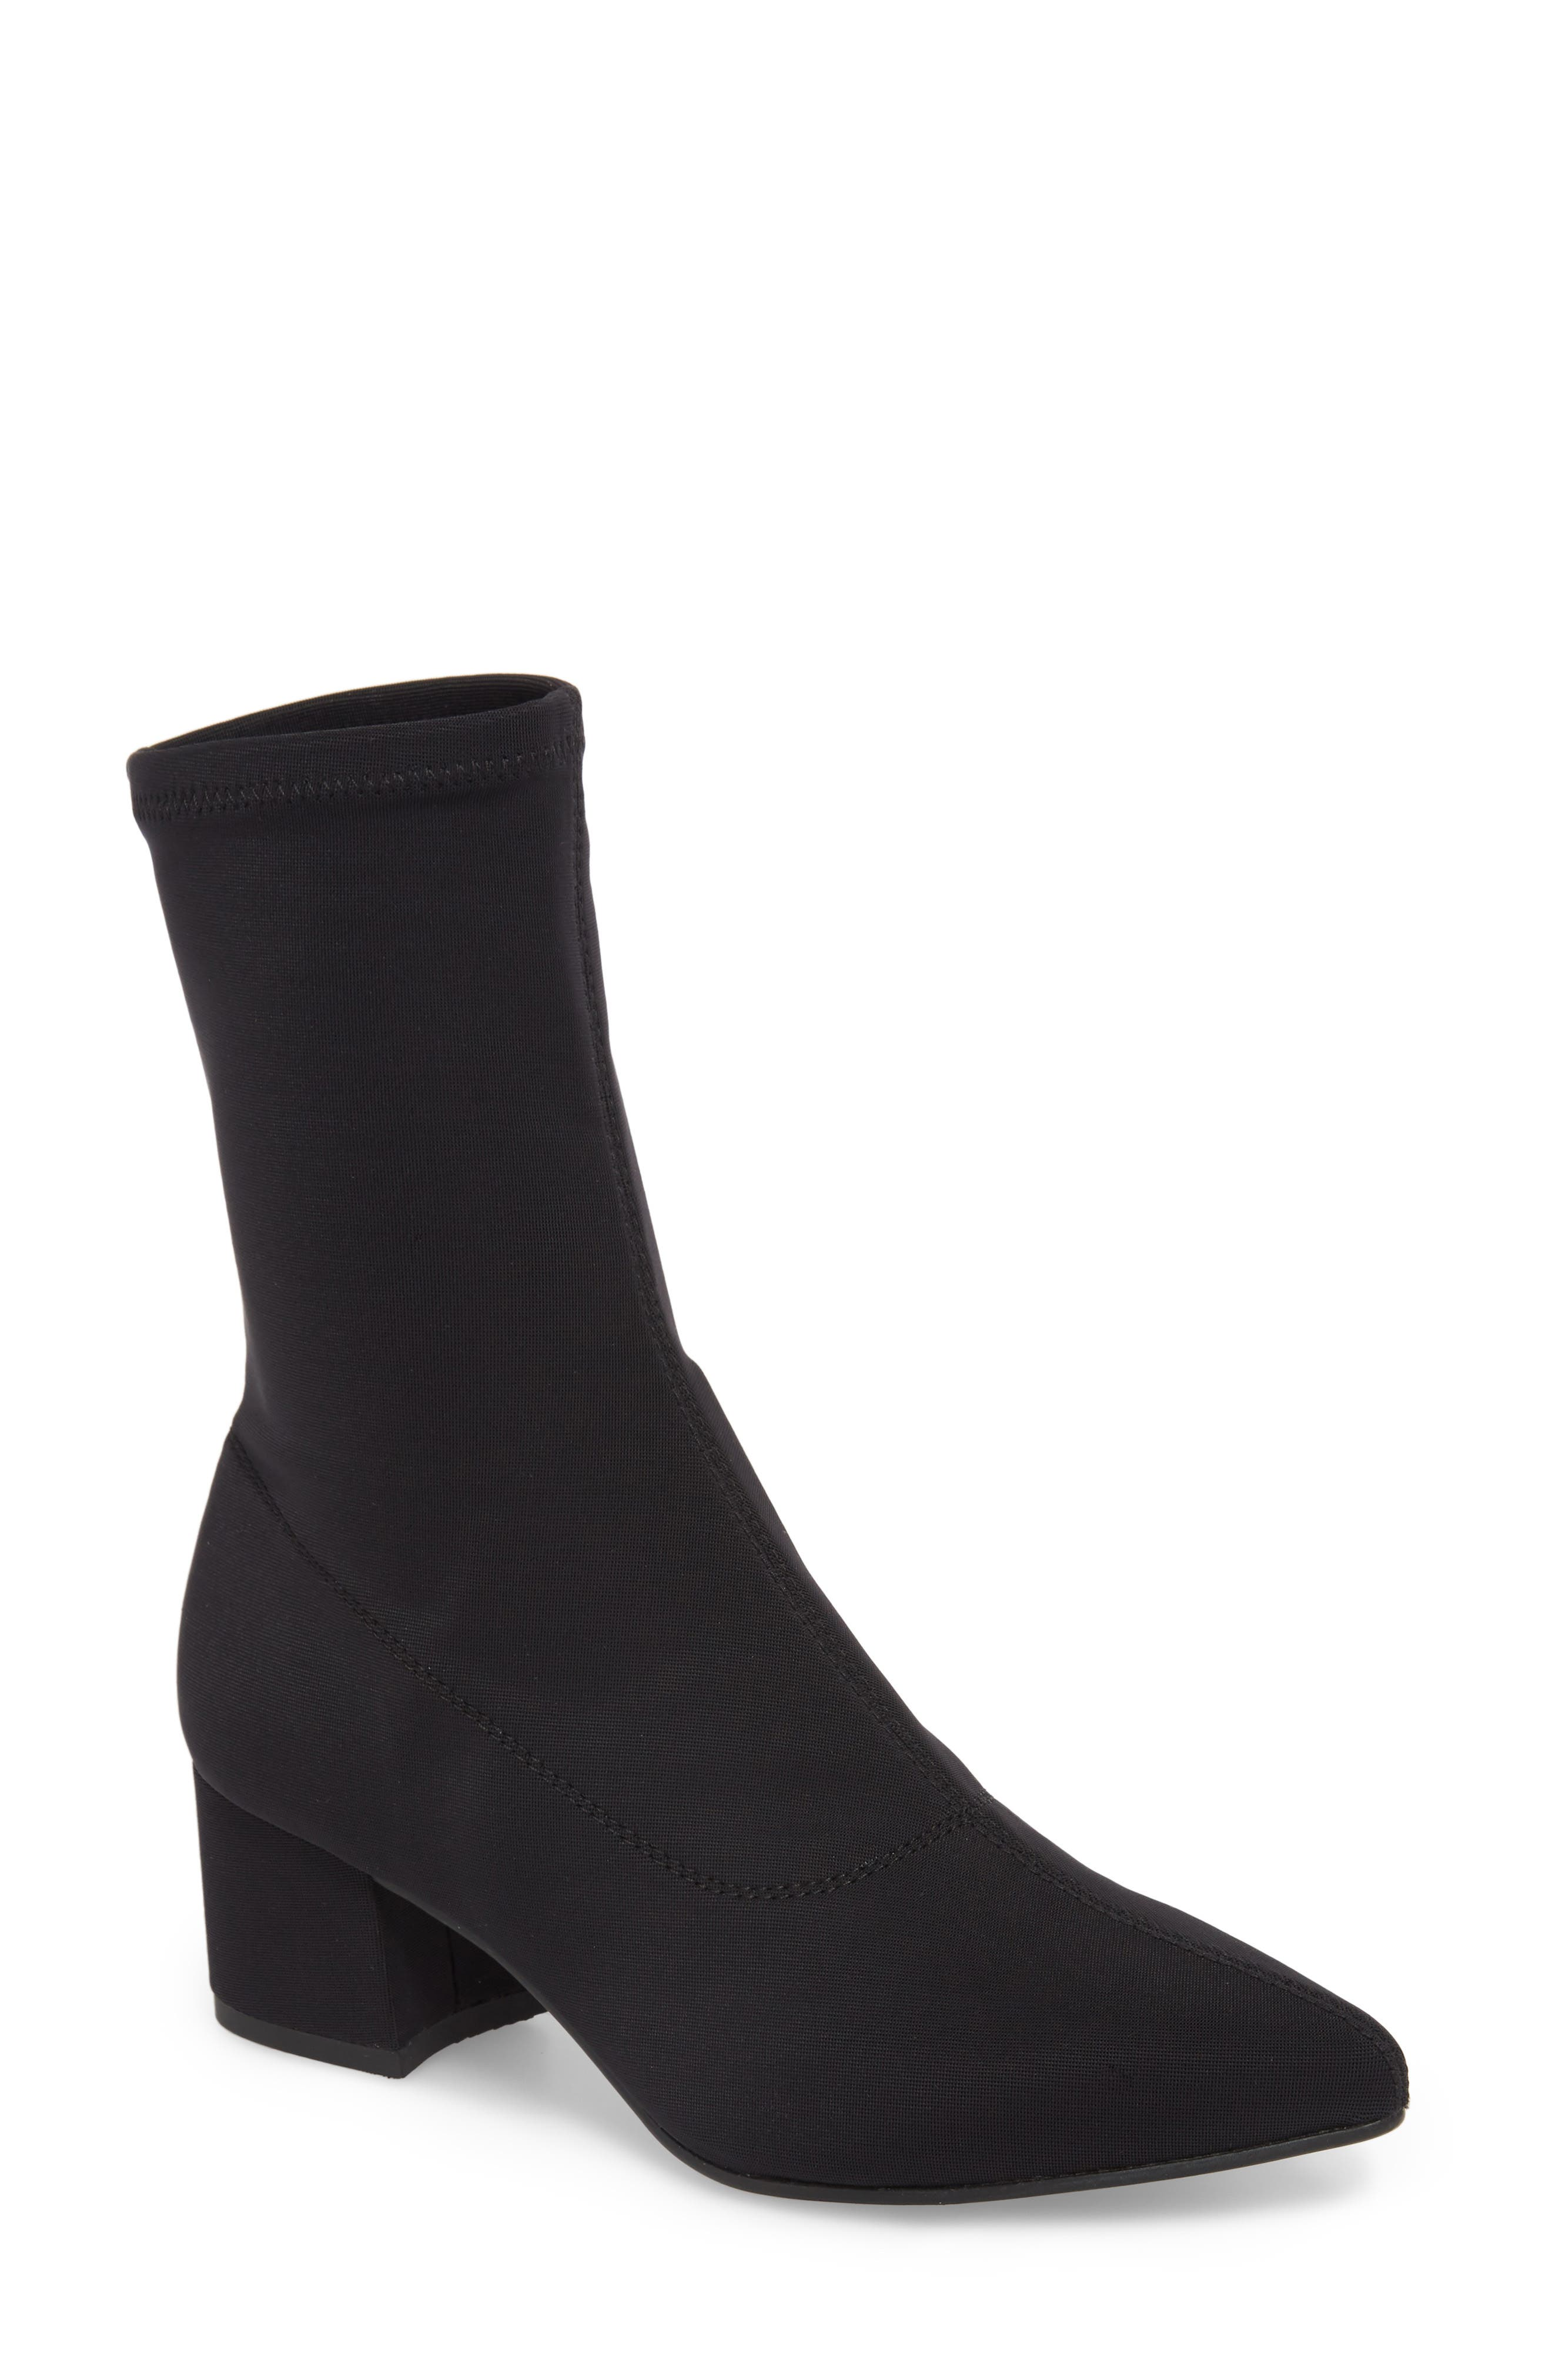 VAGABOND, Shoemakers Maya Stretch Bootie, Main thumbnail 1, color, BLACK FABRIC